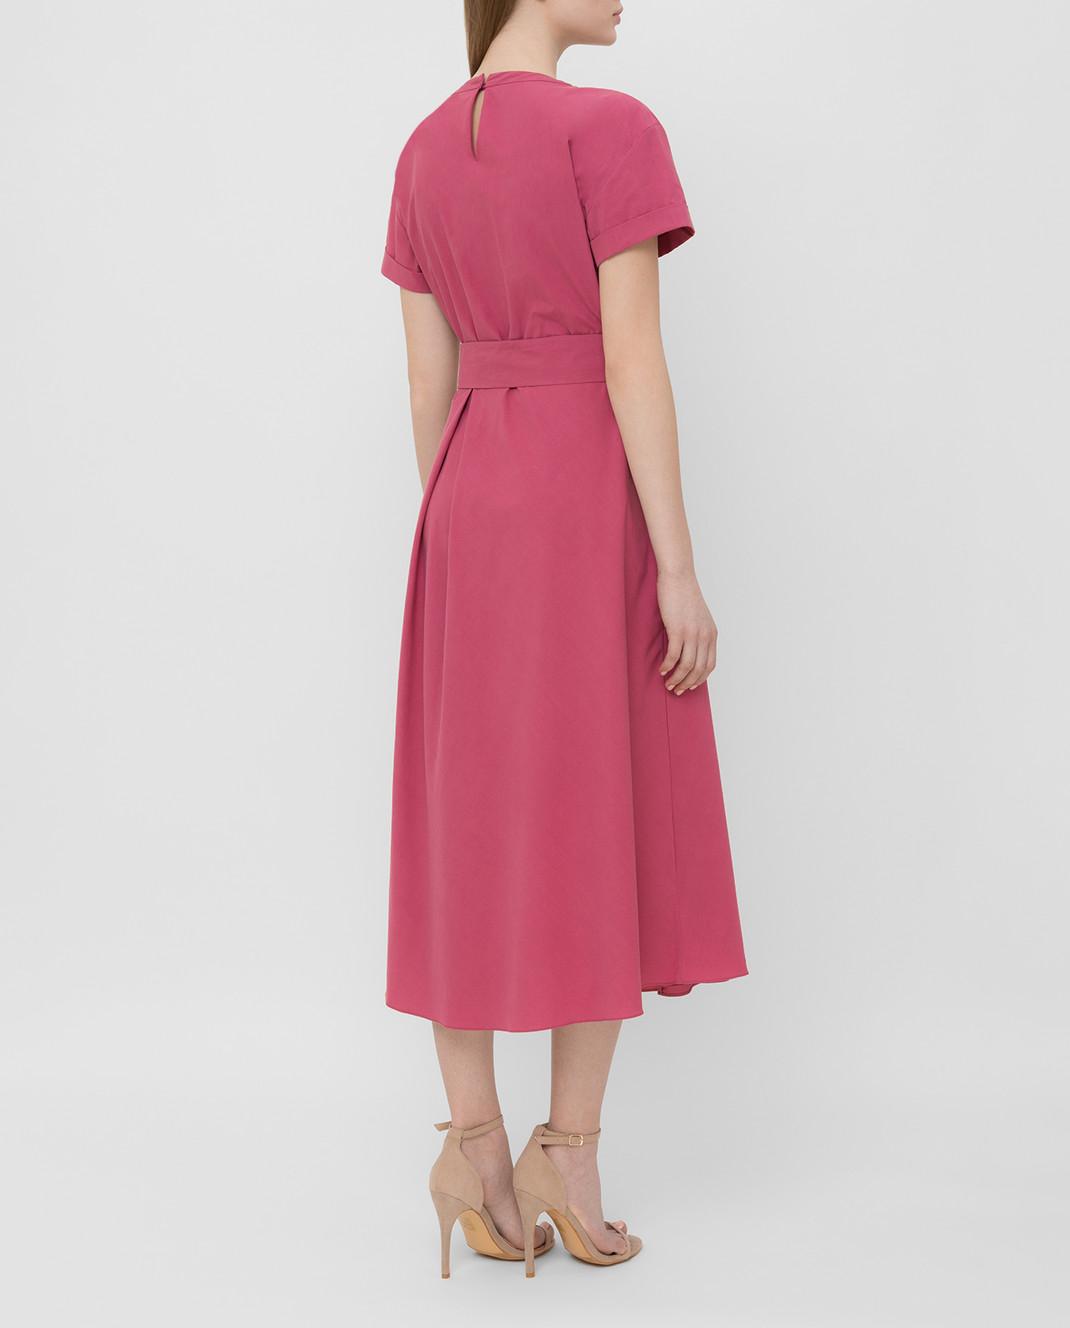 Brunello Cucinelli Розовое платье MH127ABV72 изображение 4